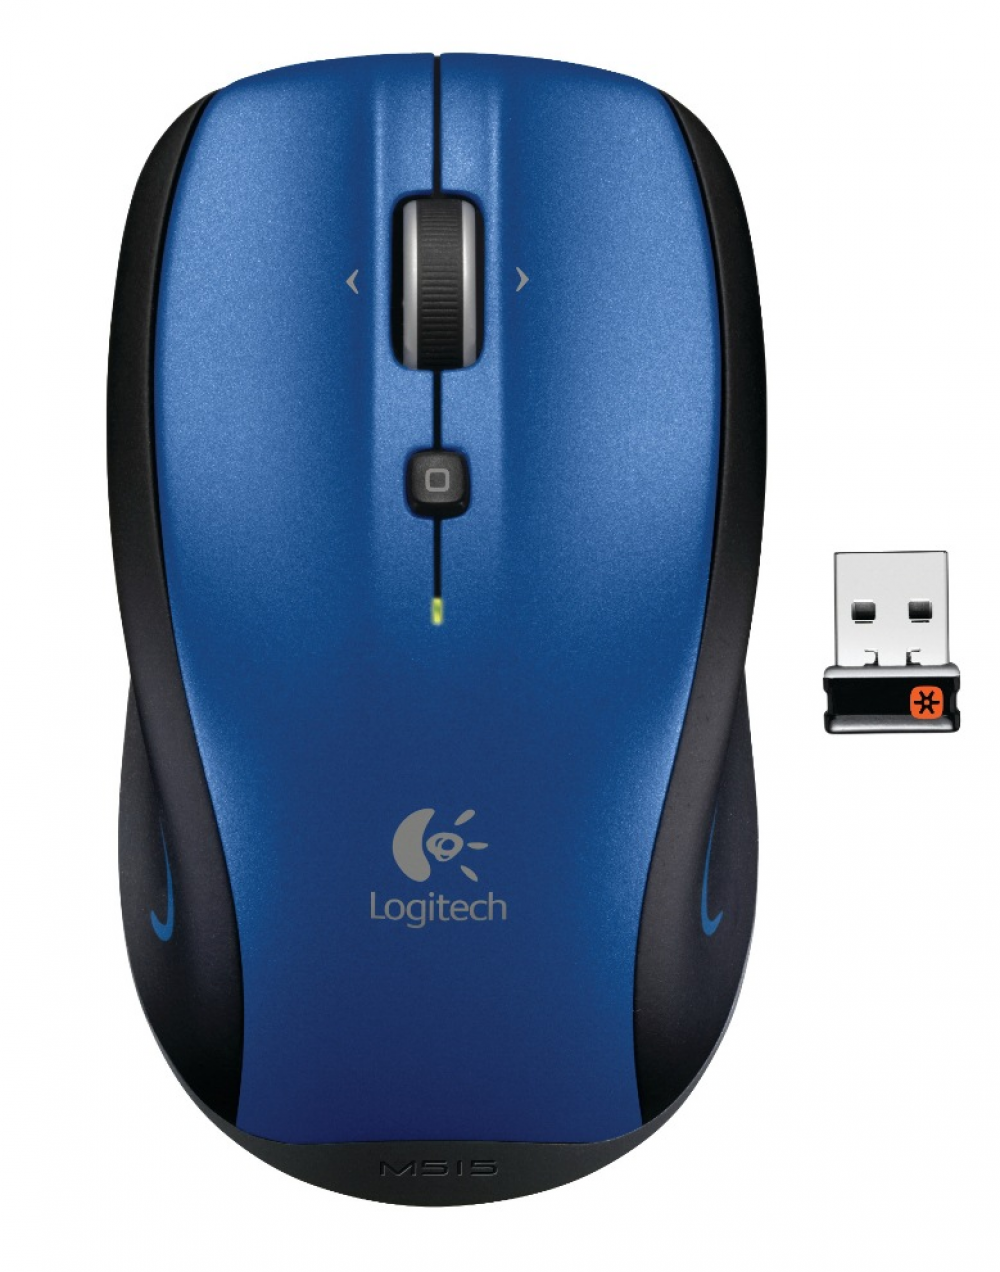 Logitech Wireless M515